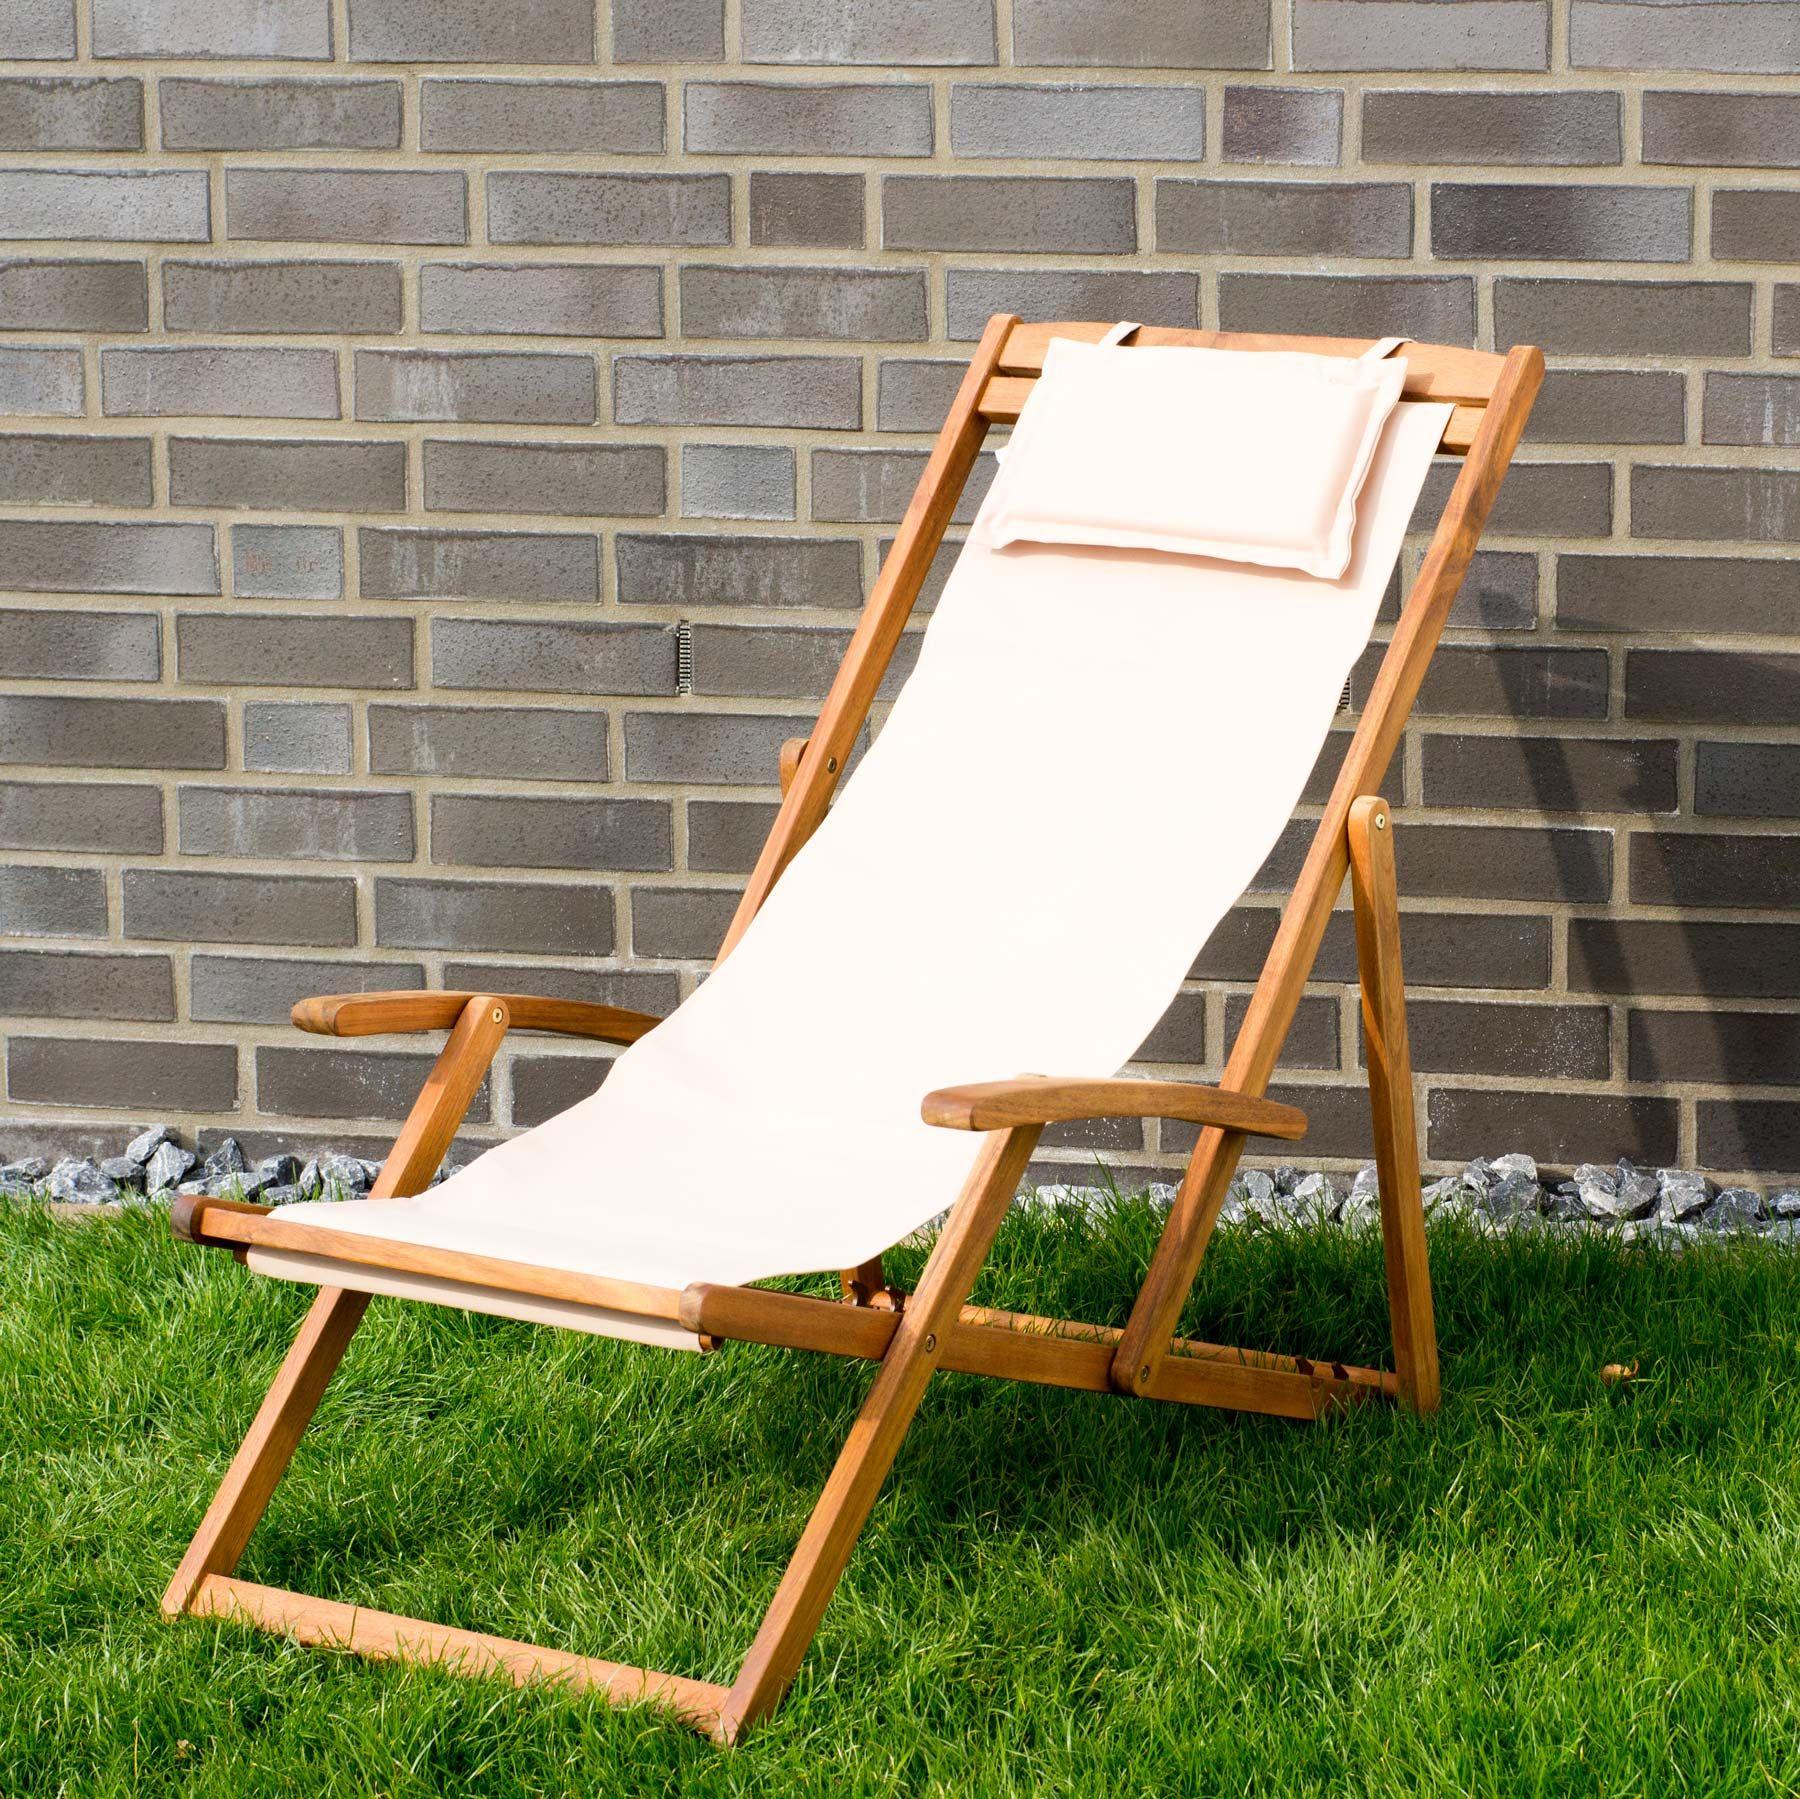 Full Size of Liegestuhl Holz Stoff Ikea Klappbar Holzhaus Kind Garten Esstisch Holzplatte Betten Aus Massivholz Ausziehbar Regal Naturholz Modulküche Küche Weiß Alu Wohnzimmer Liegestuhl Holz Ikea